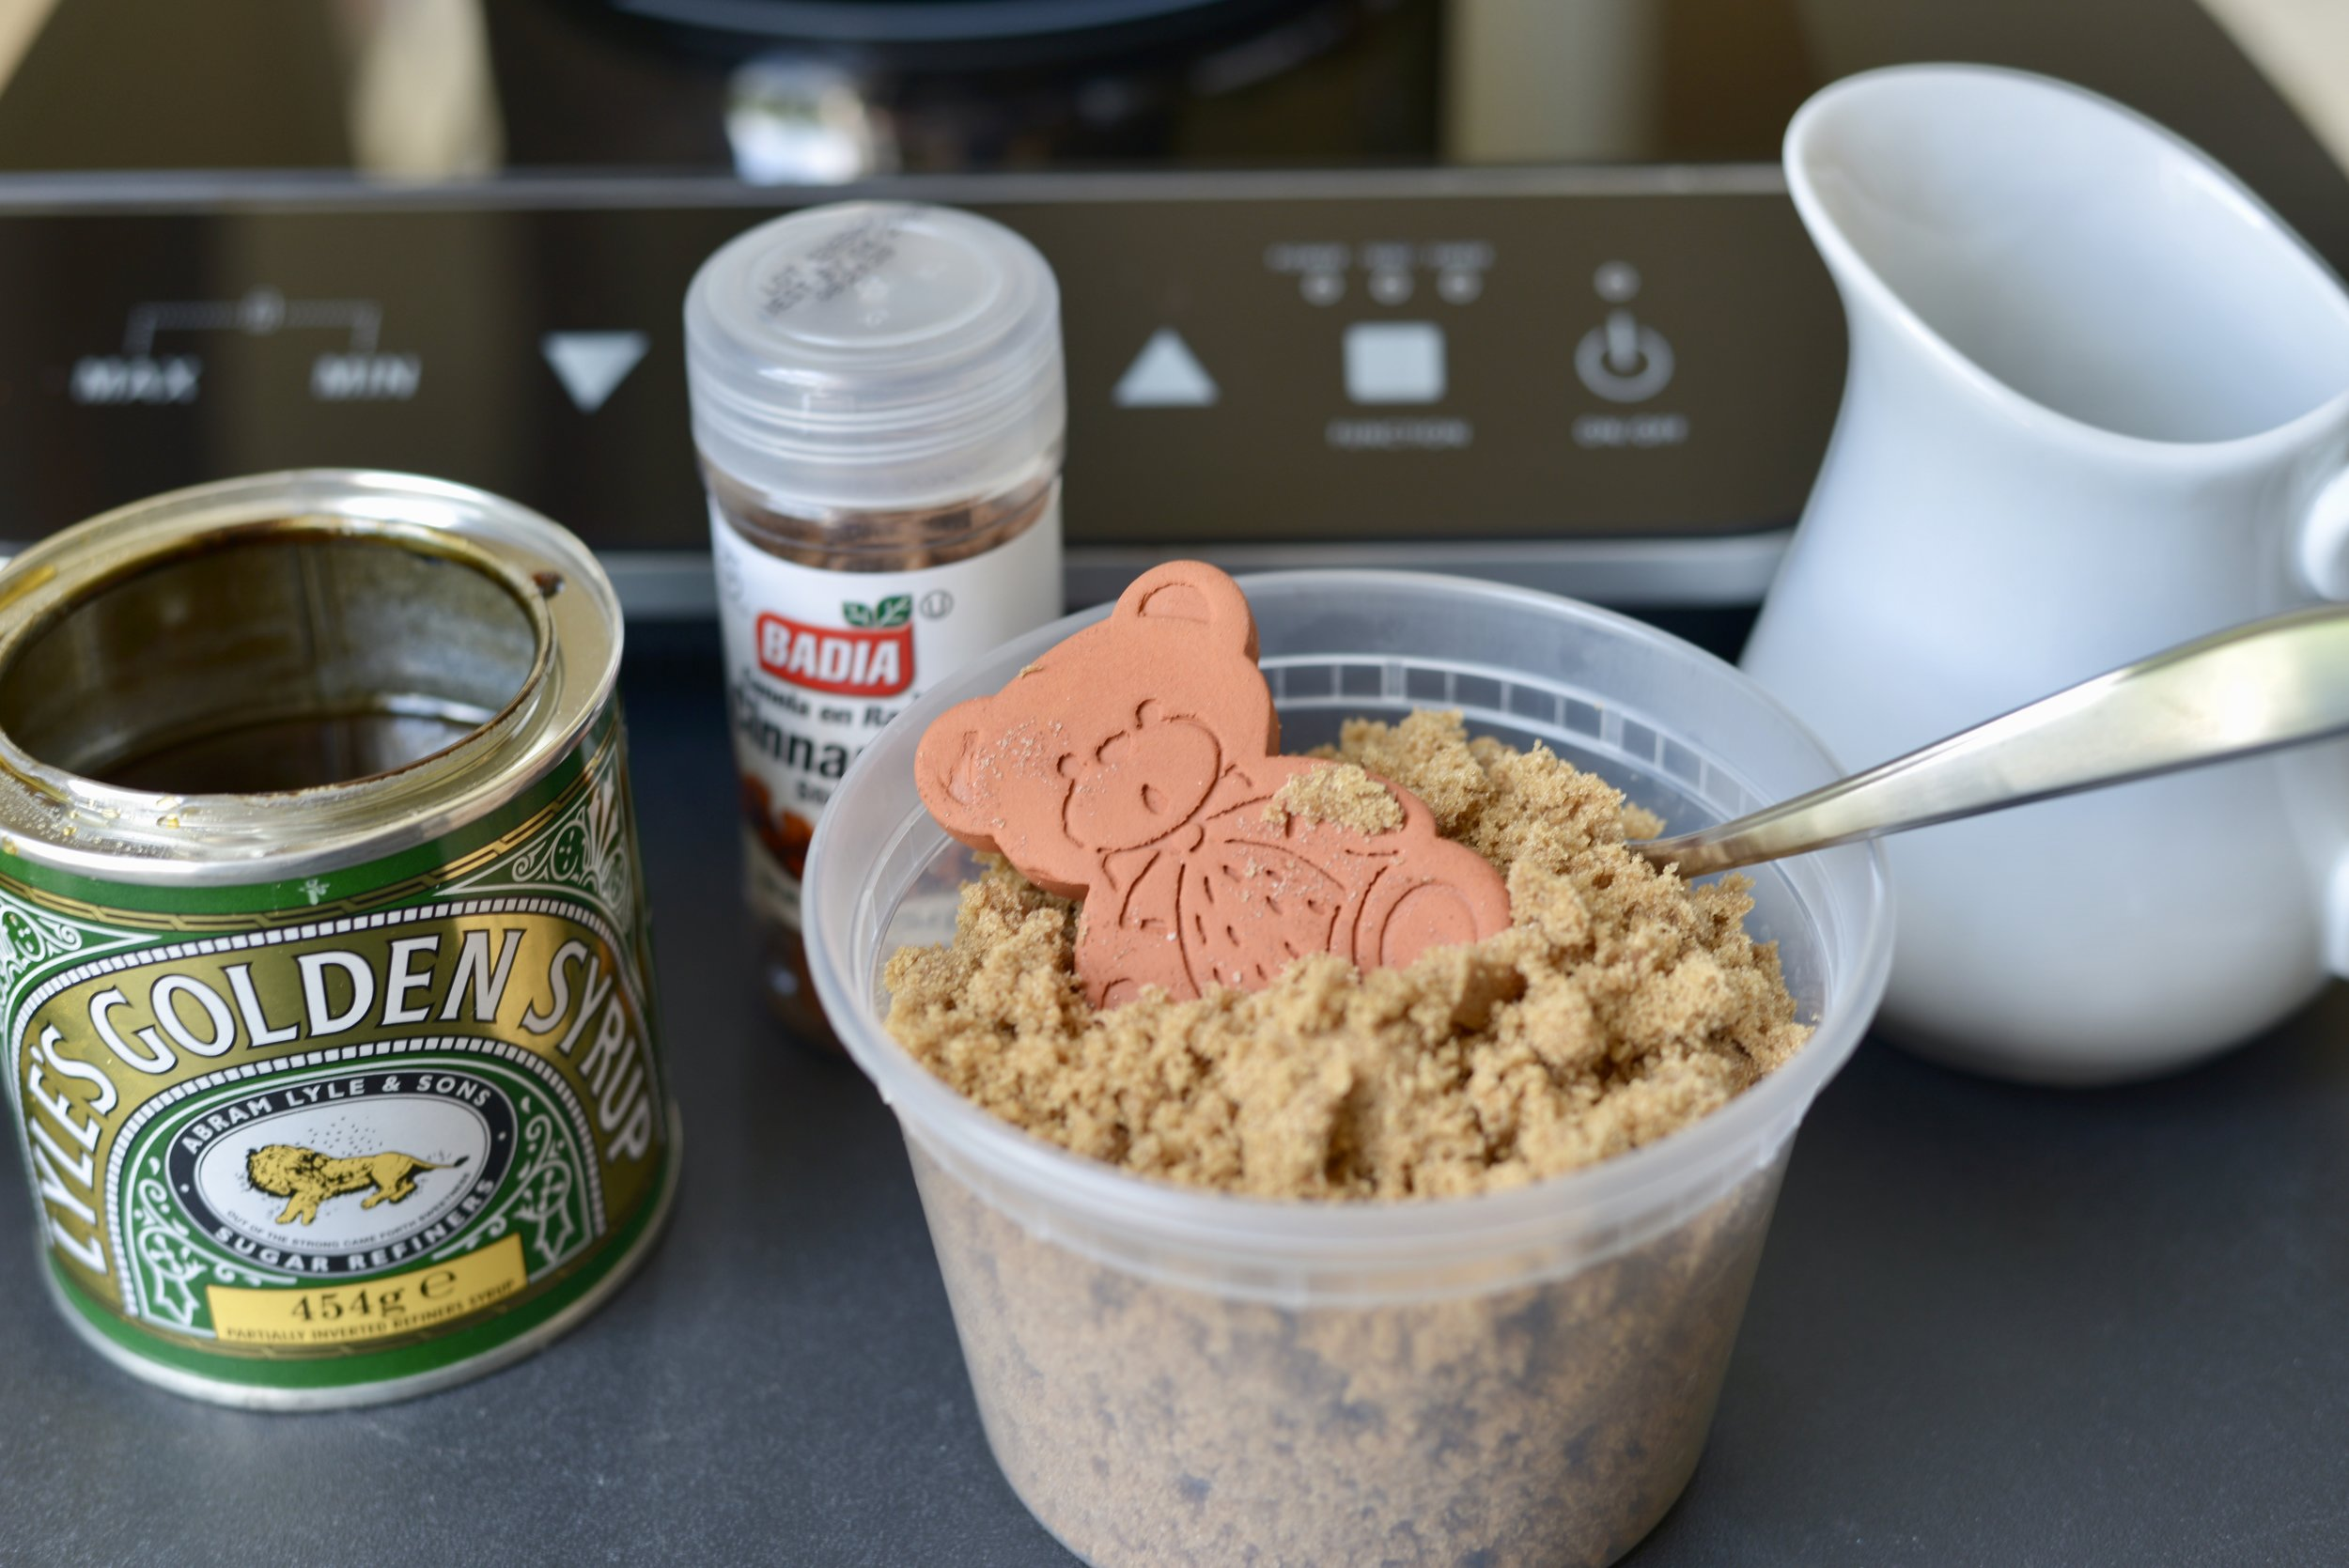 keep-brown-sugar-soft-with-sugar-bear-butteryum